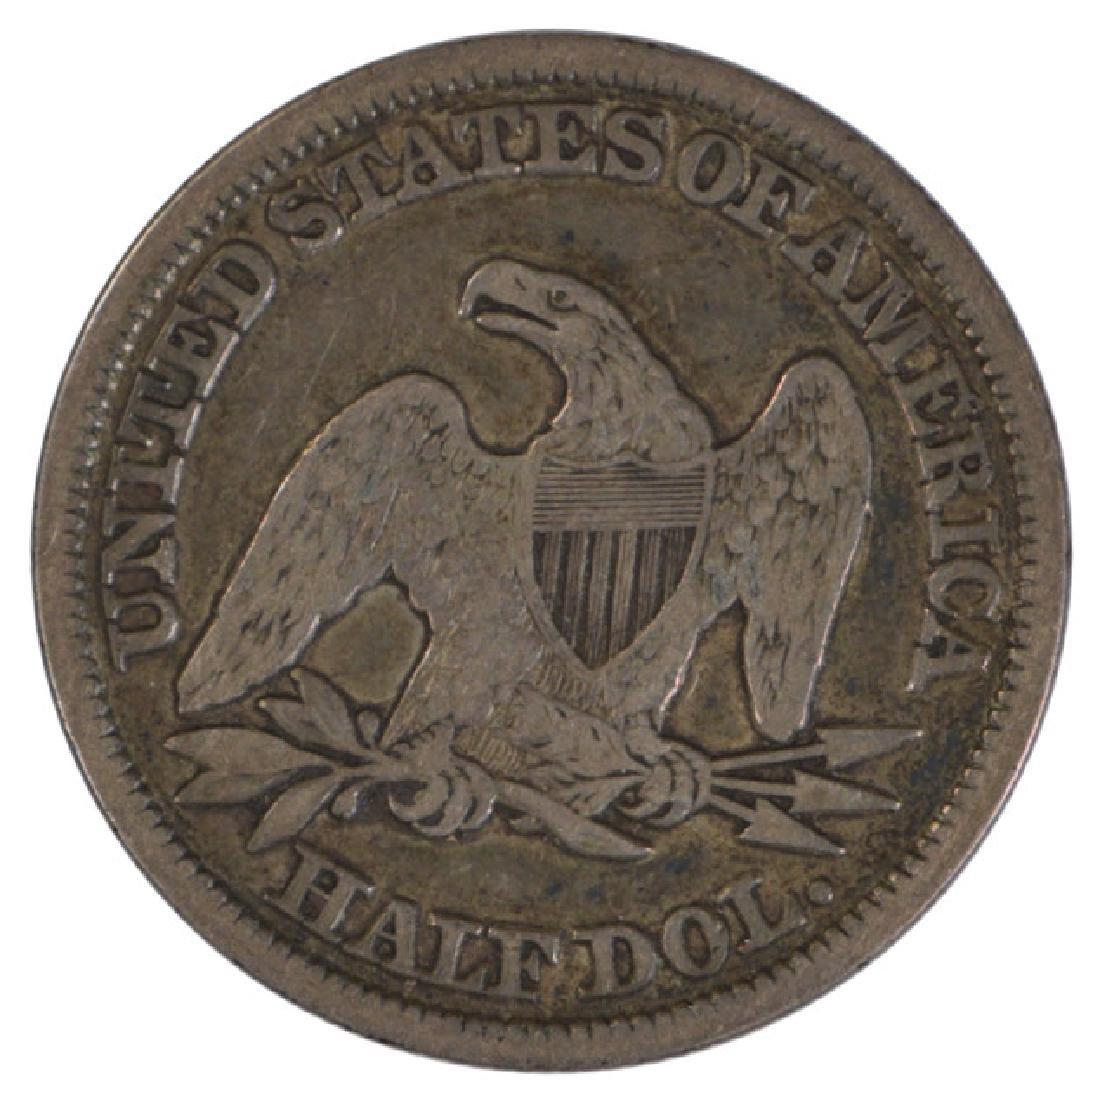 1847 Liberty Seated Half Dollar Coin - 2